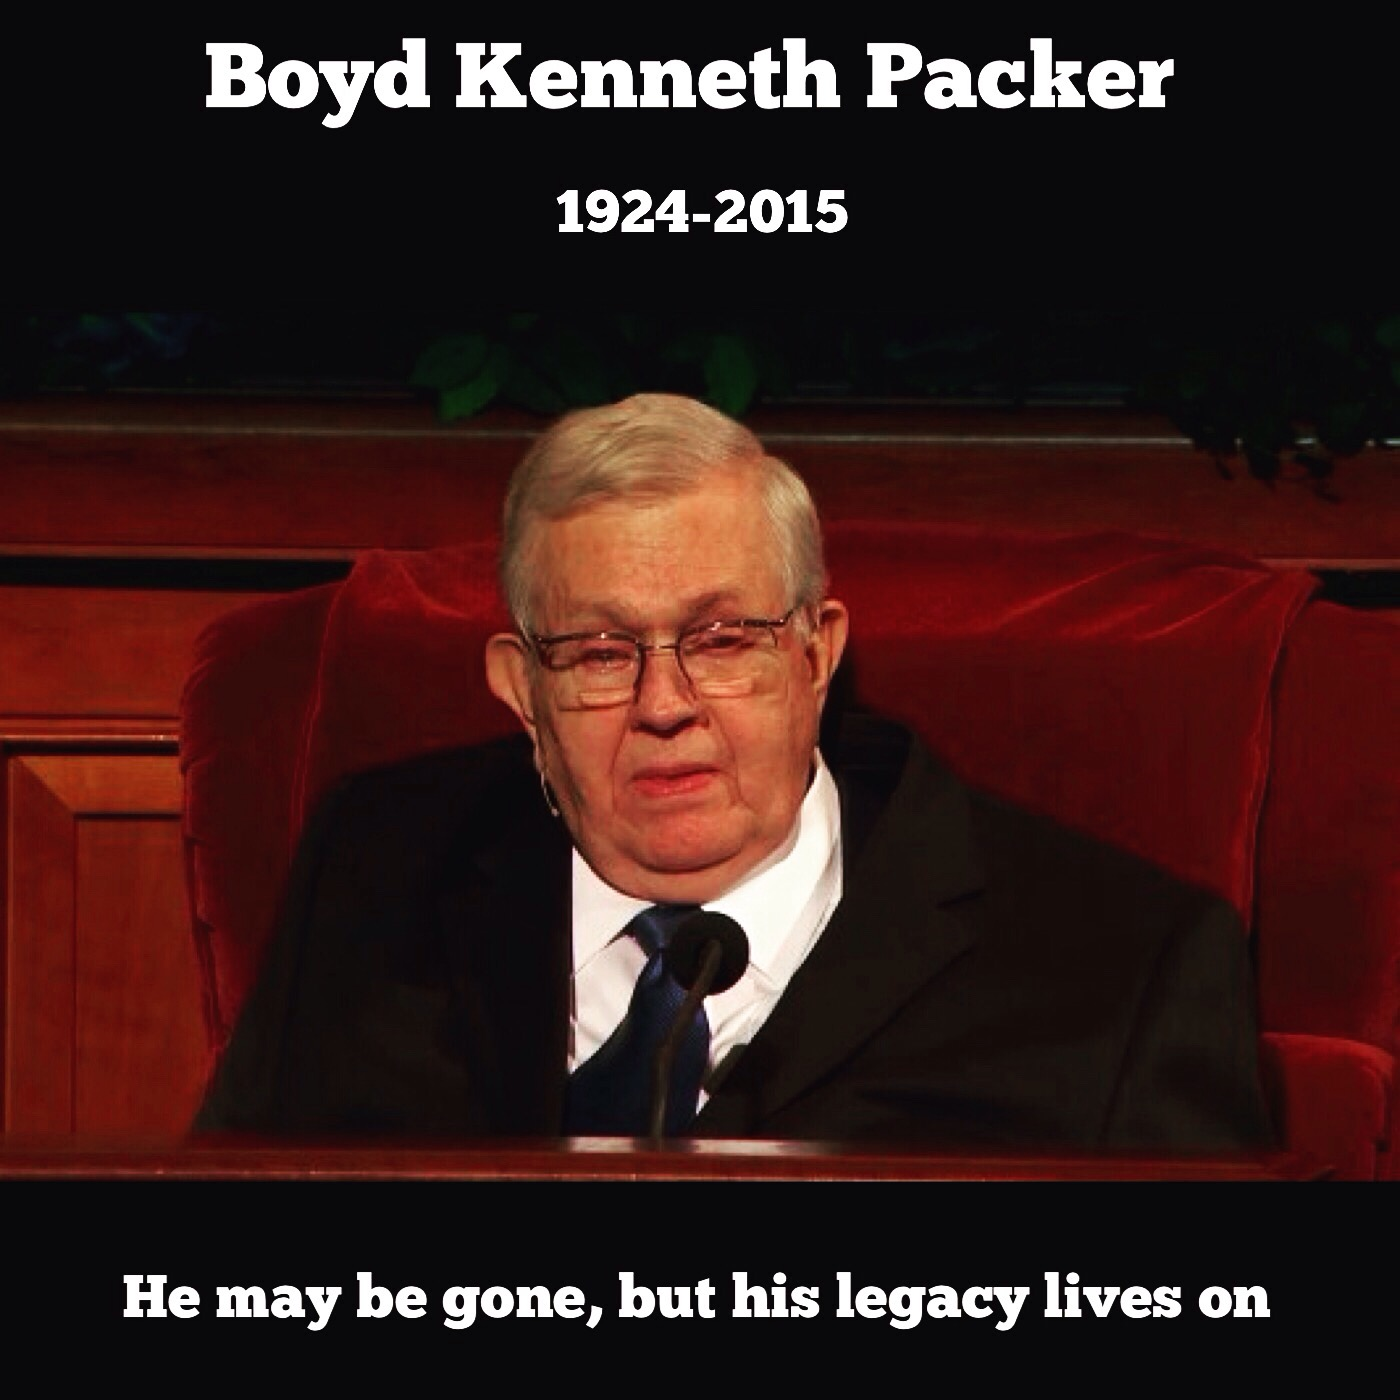 RIP Boyd K. Packer